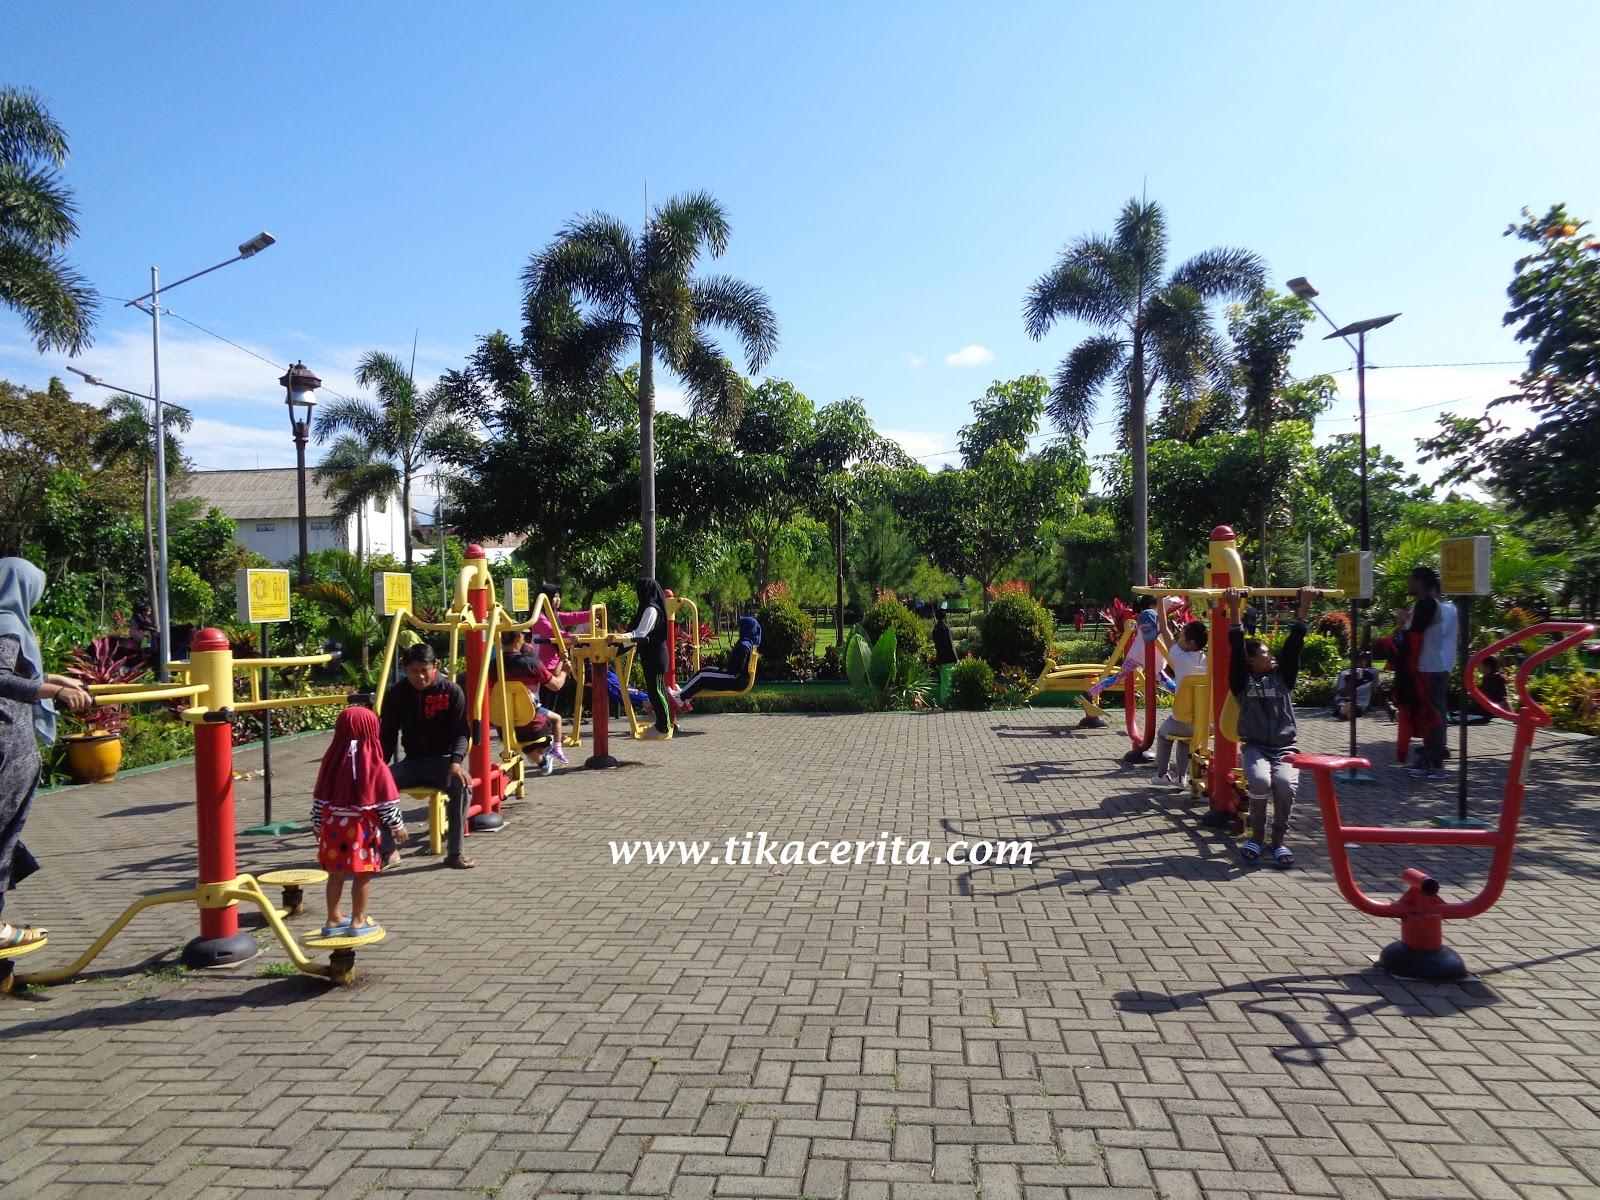 Opini Cerita Ulasan Pilihan Alat Olahraga Taman Singha Merjosari Malang